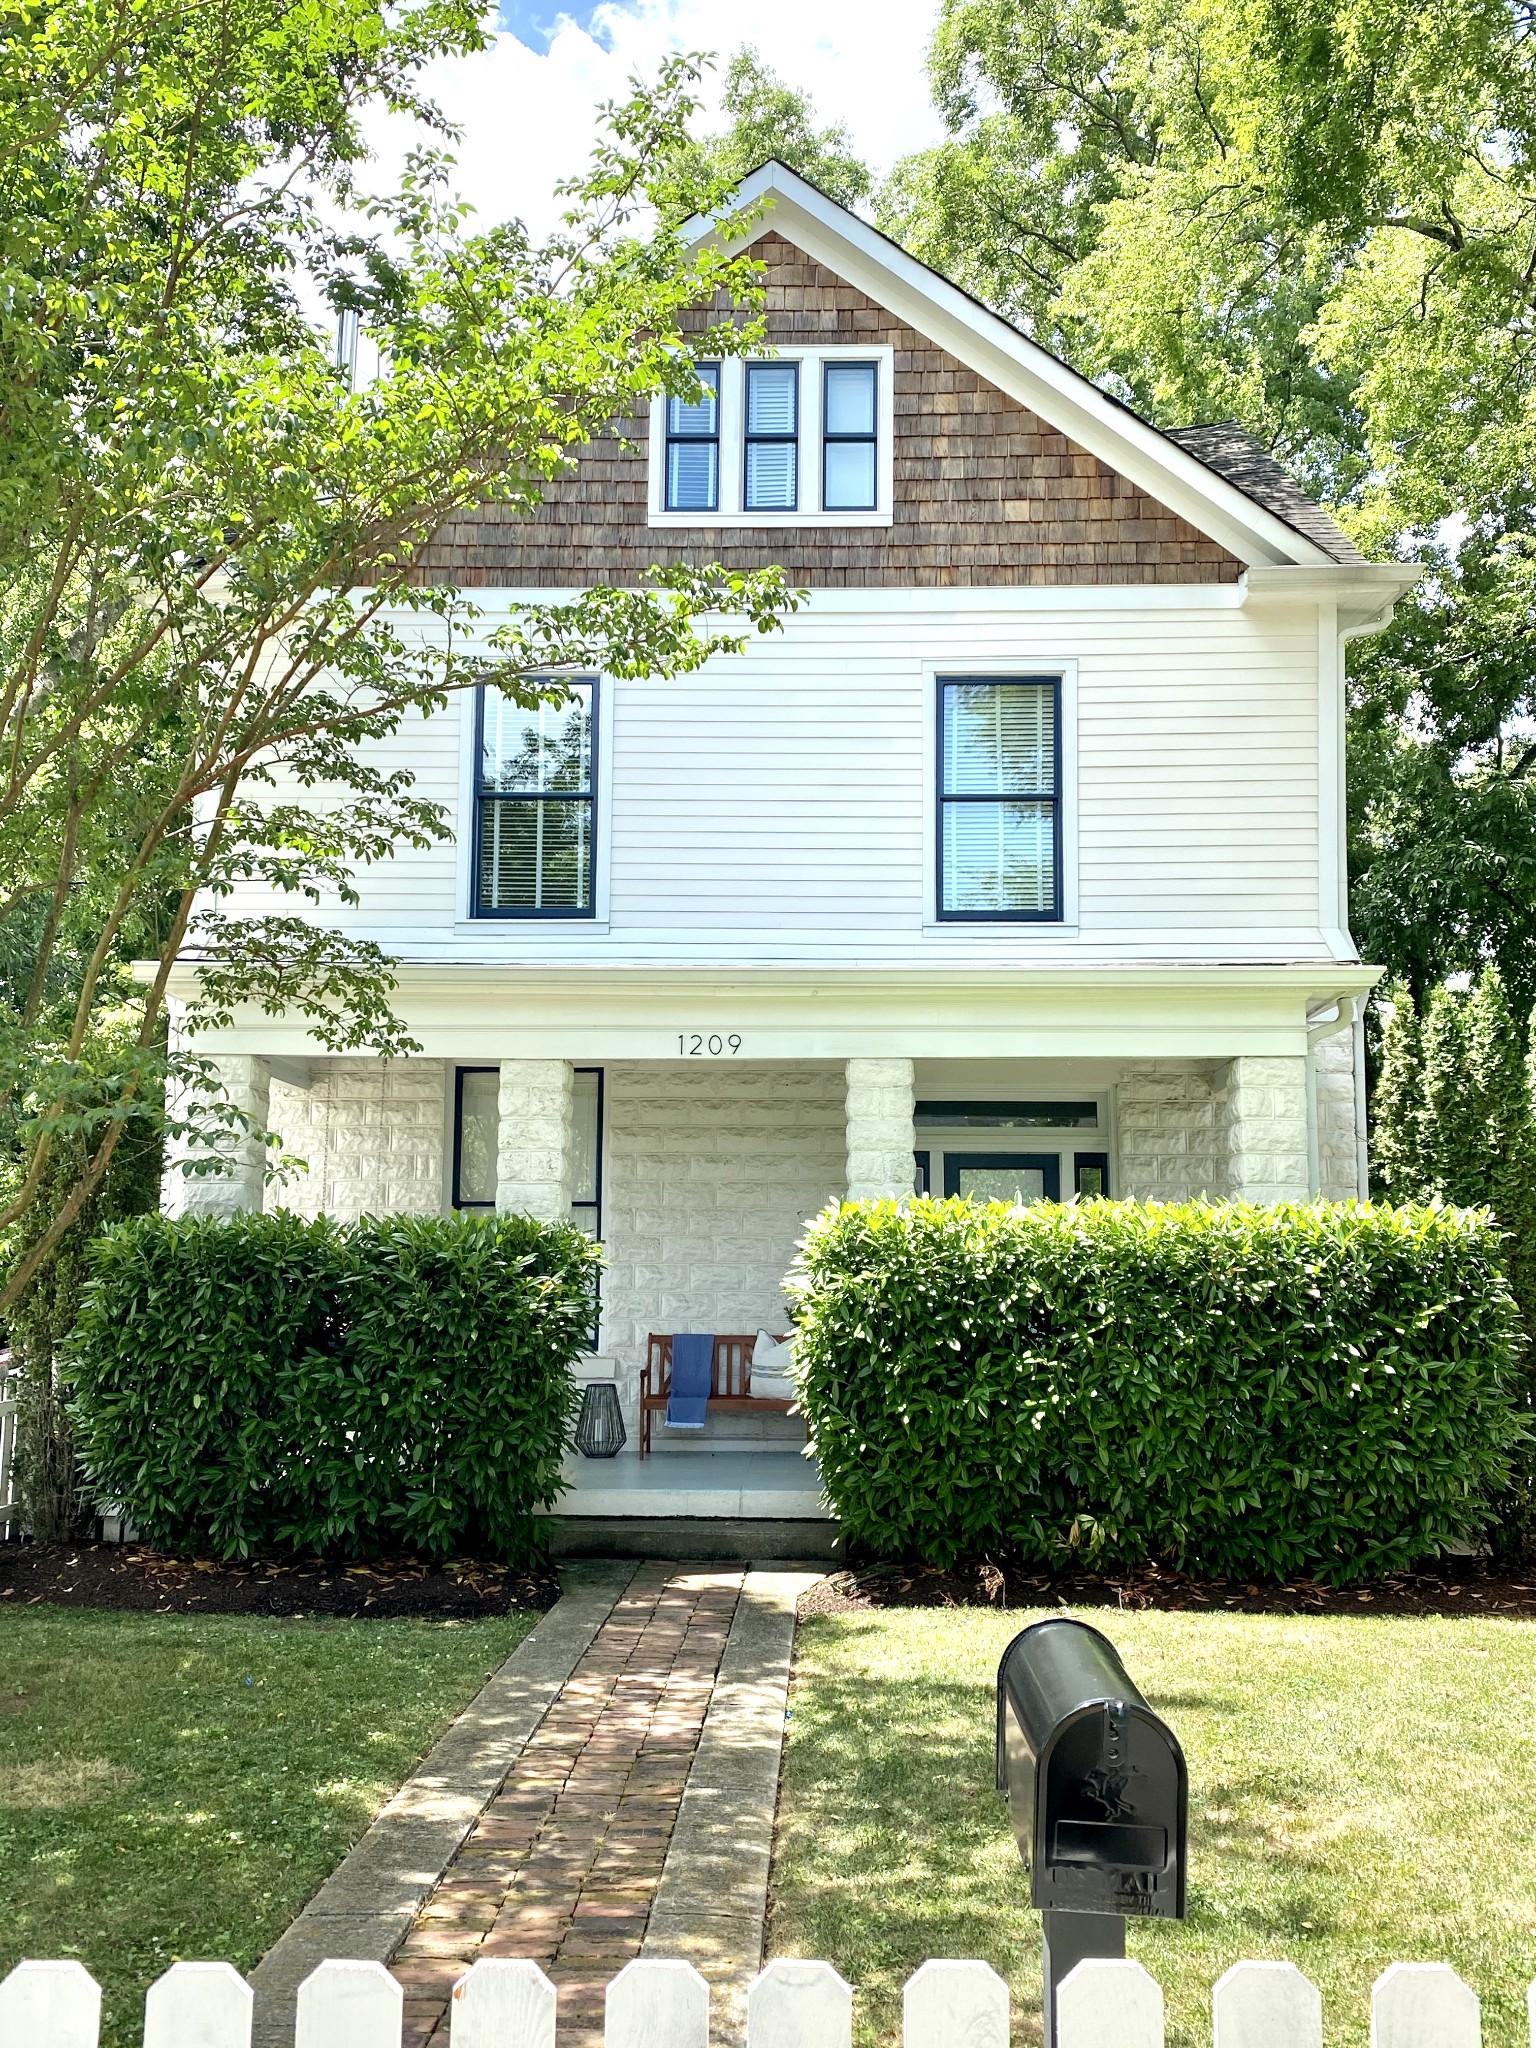 1209 Paris Ave Property Photo - Nashville, TN real estate listing